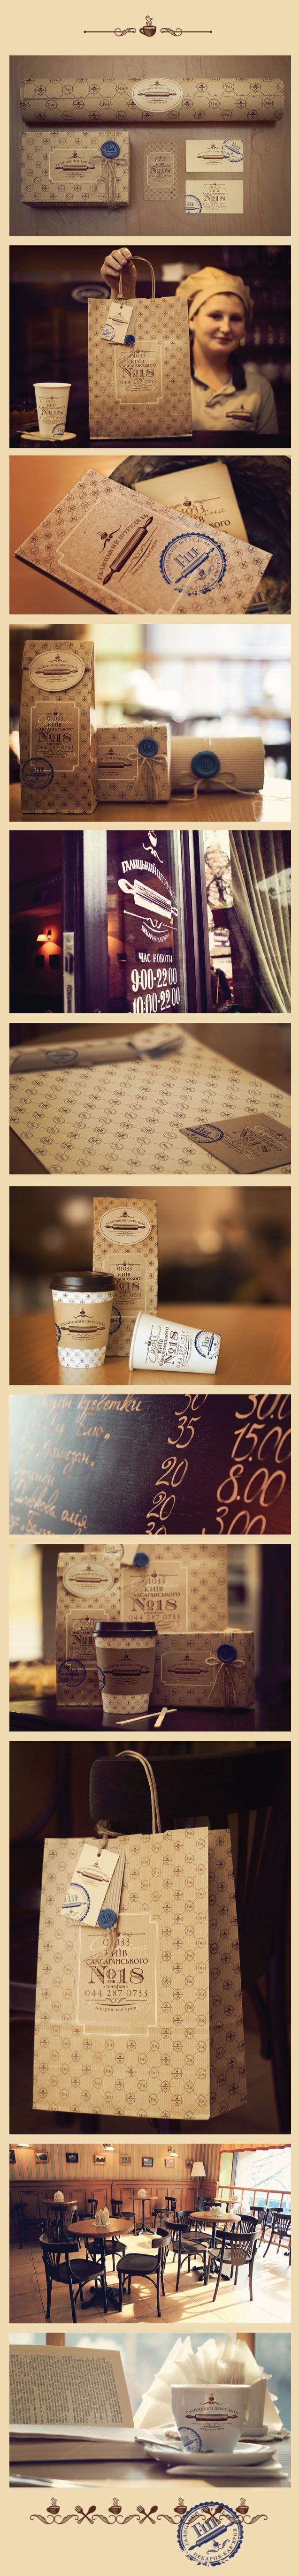 "Cafe-bakery ""Galician strudel"" by Olena Fedorova #identity #packaging #branding PD"